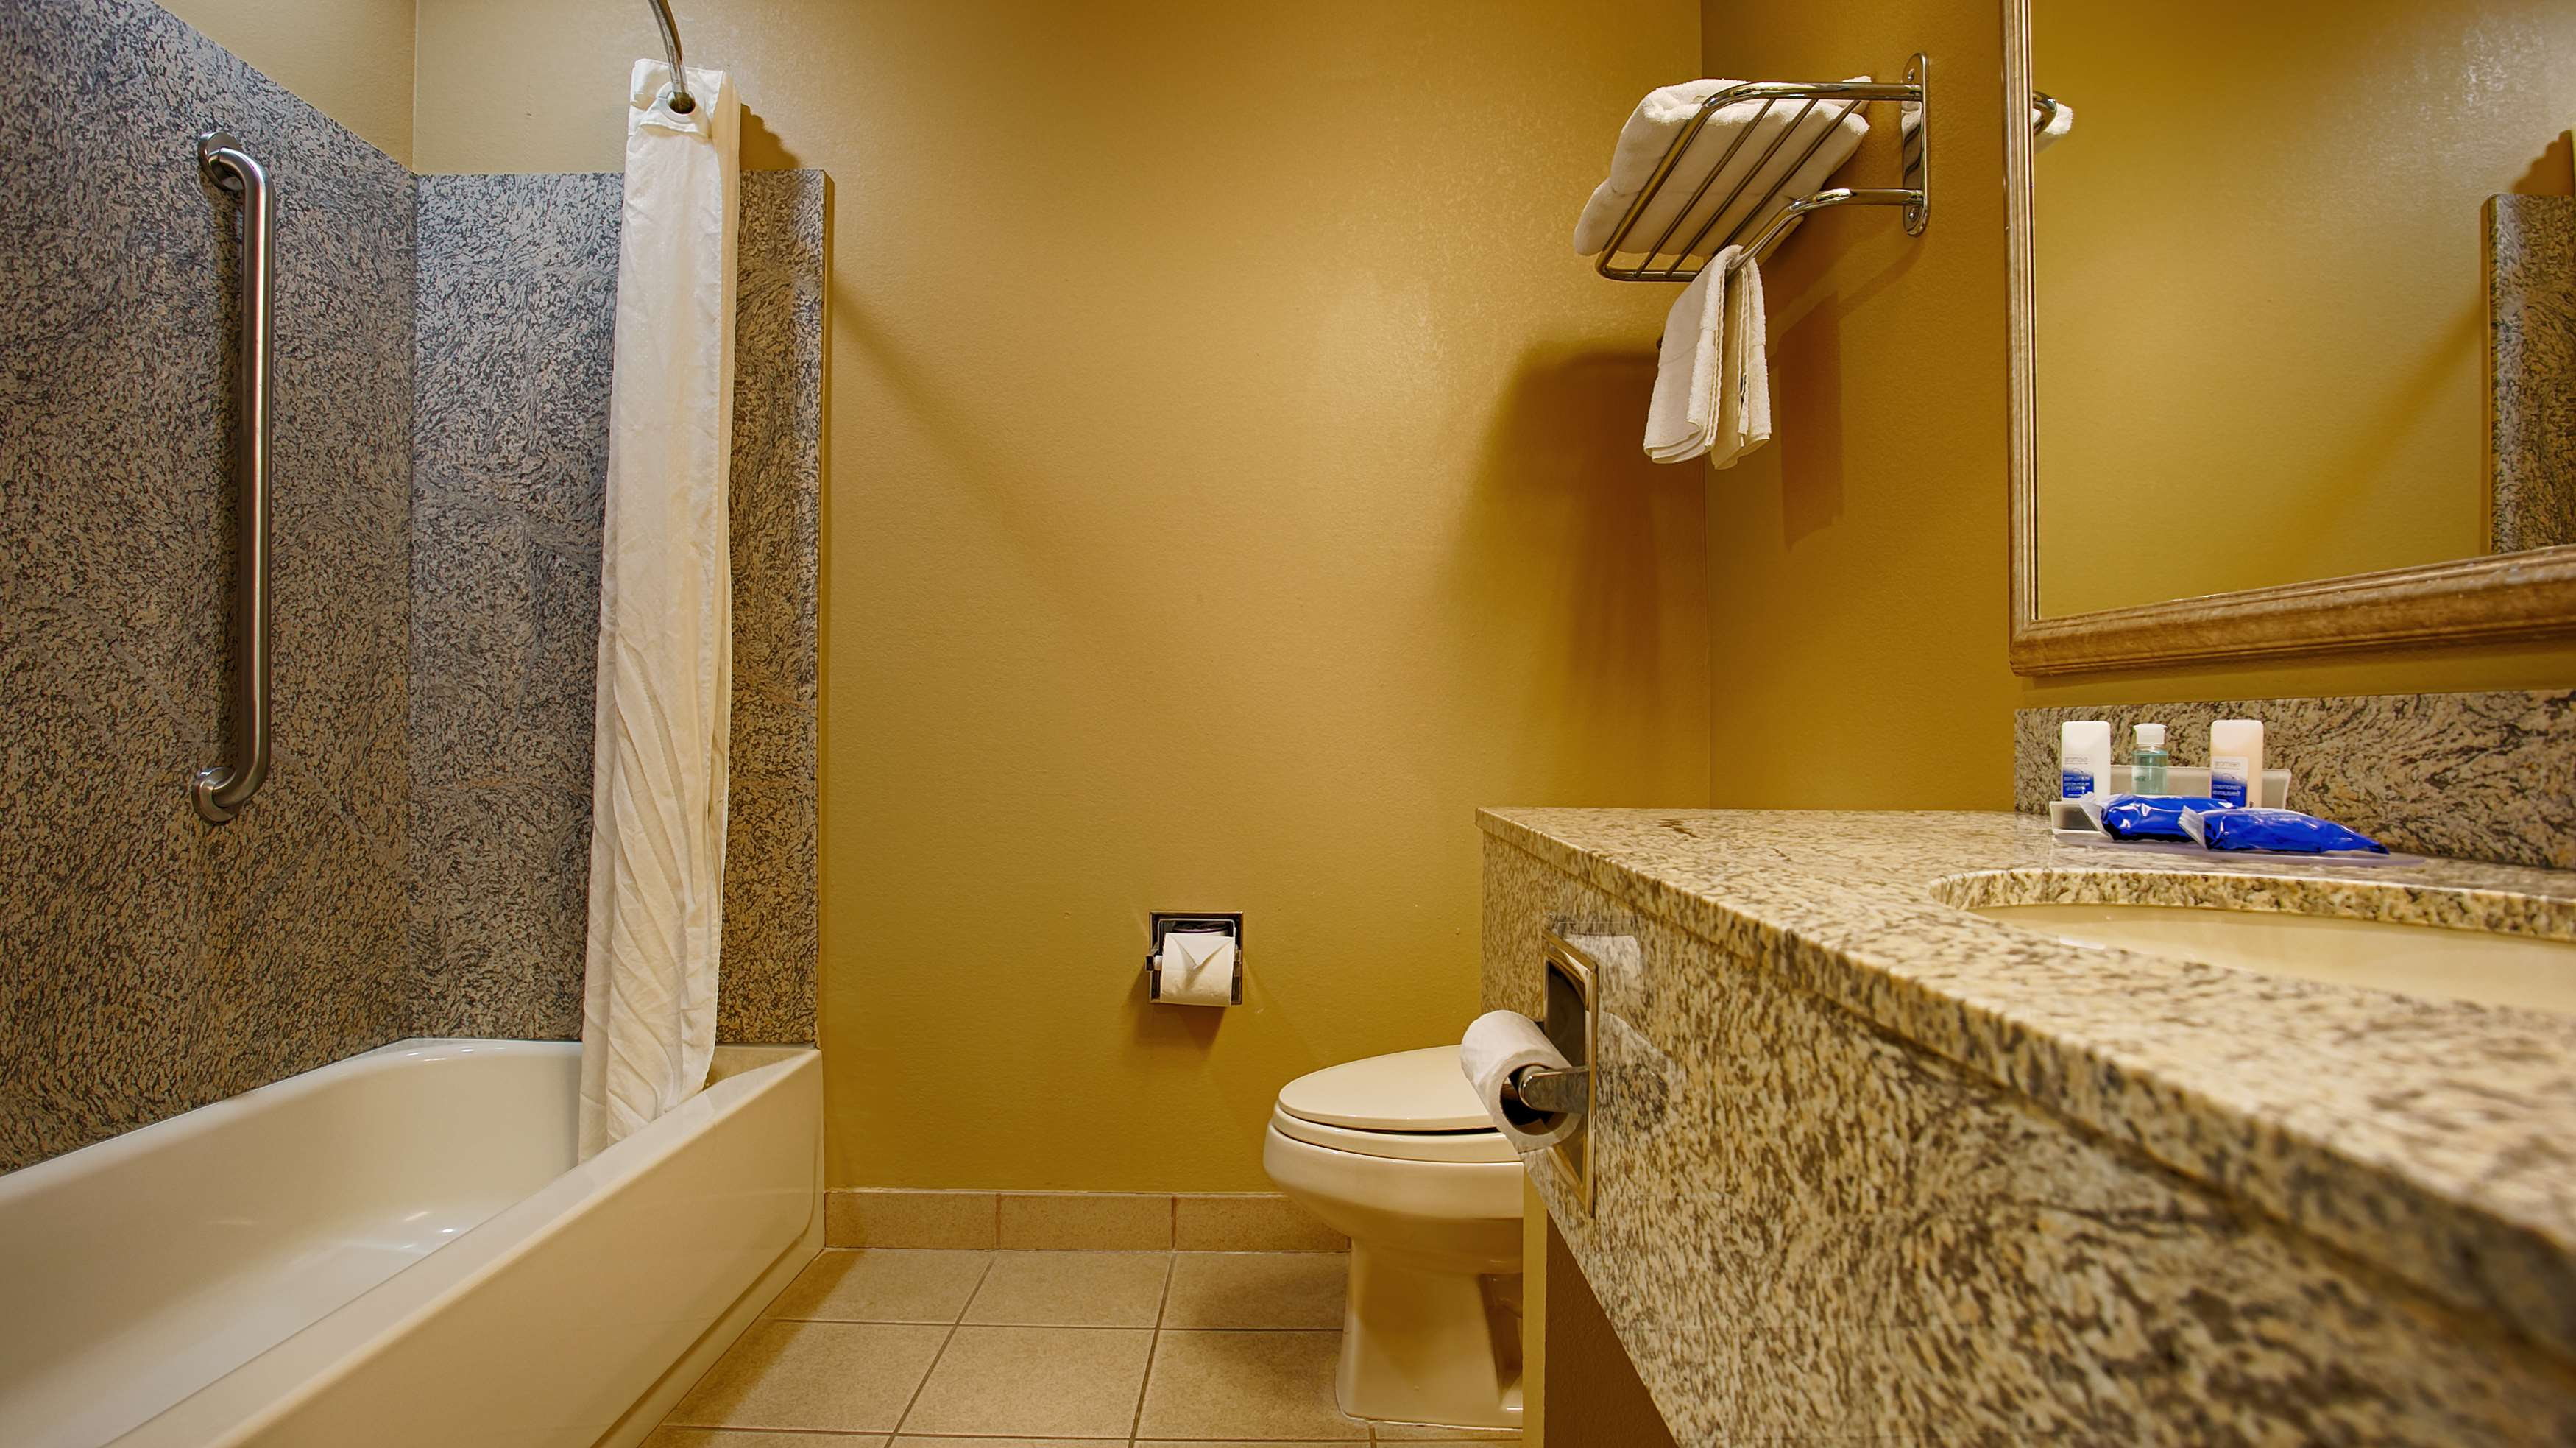 Best Western Plus Woodland Hills Hotel & Suites image 24